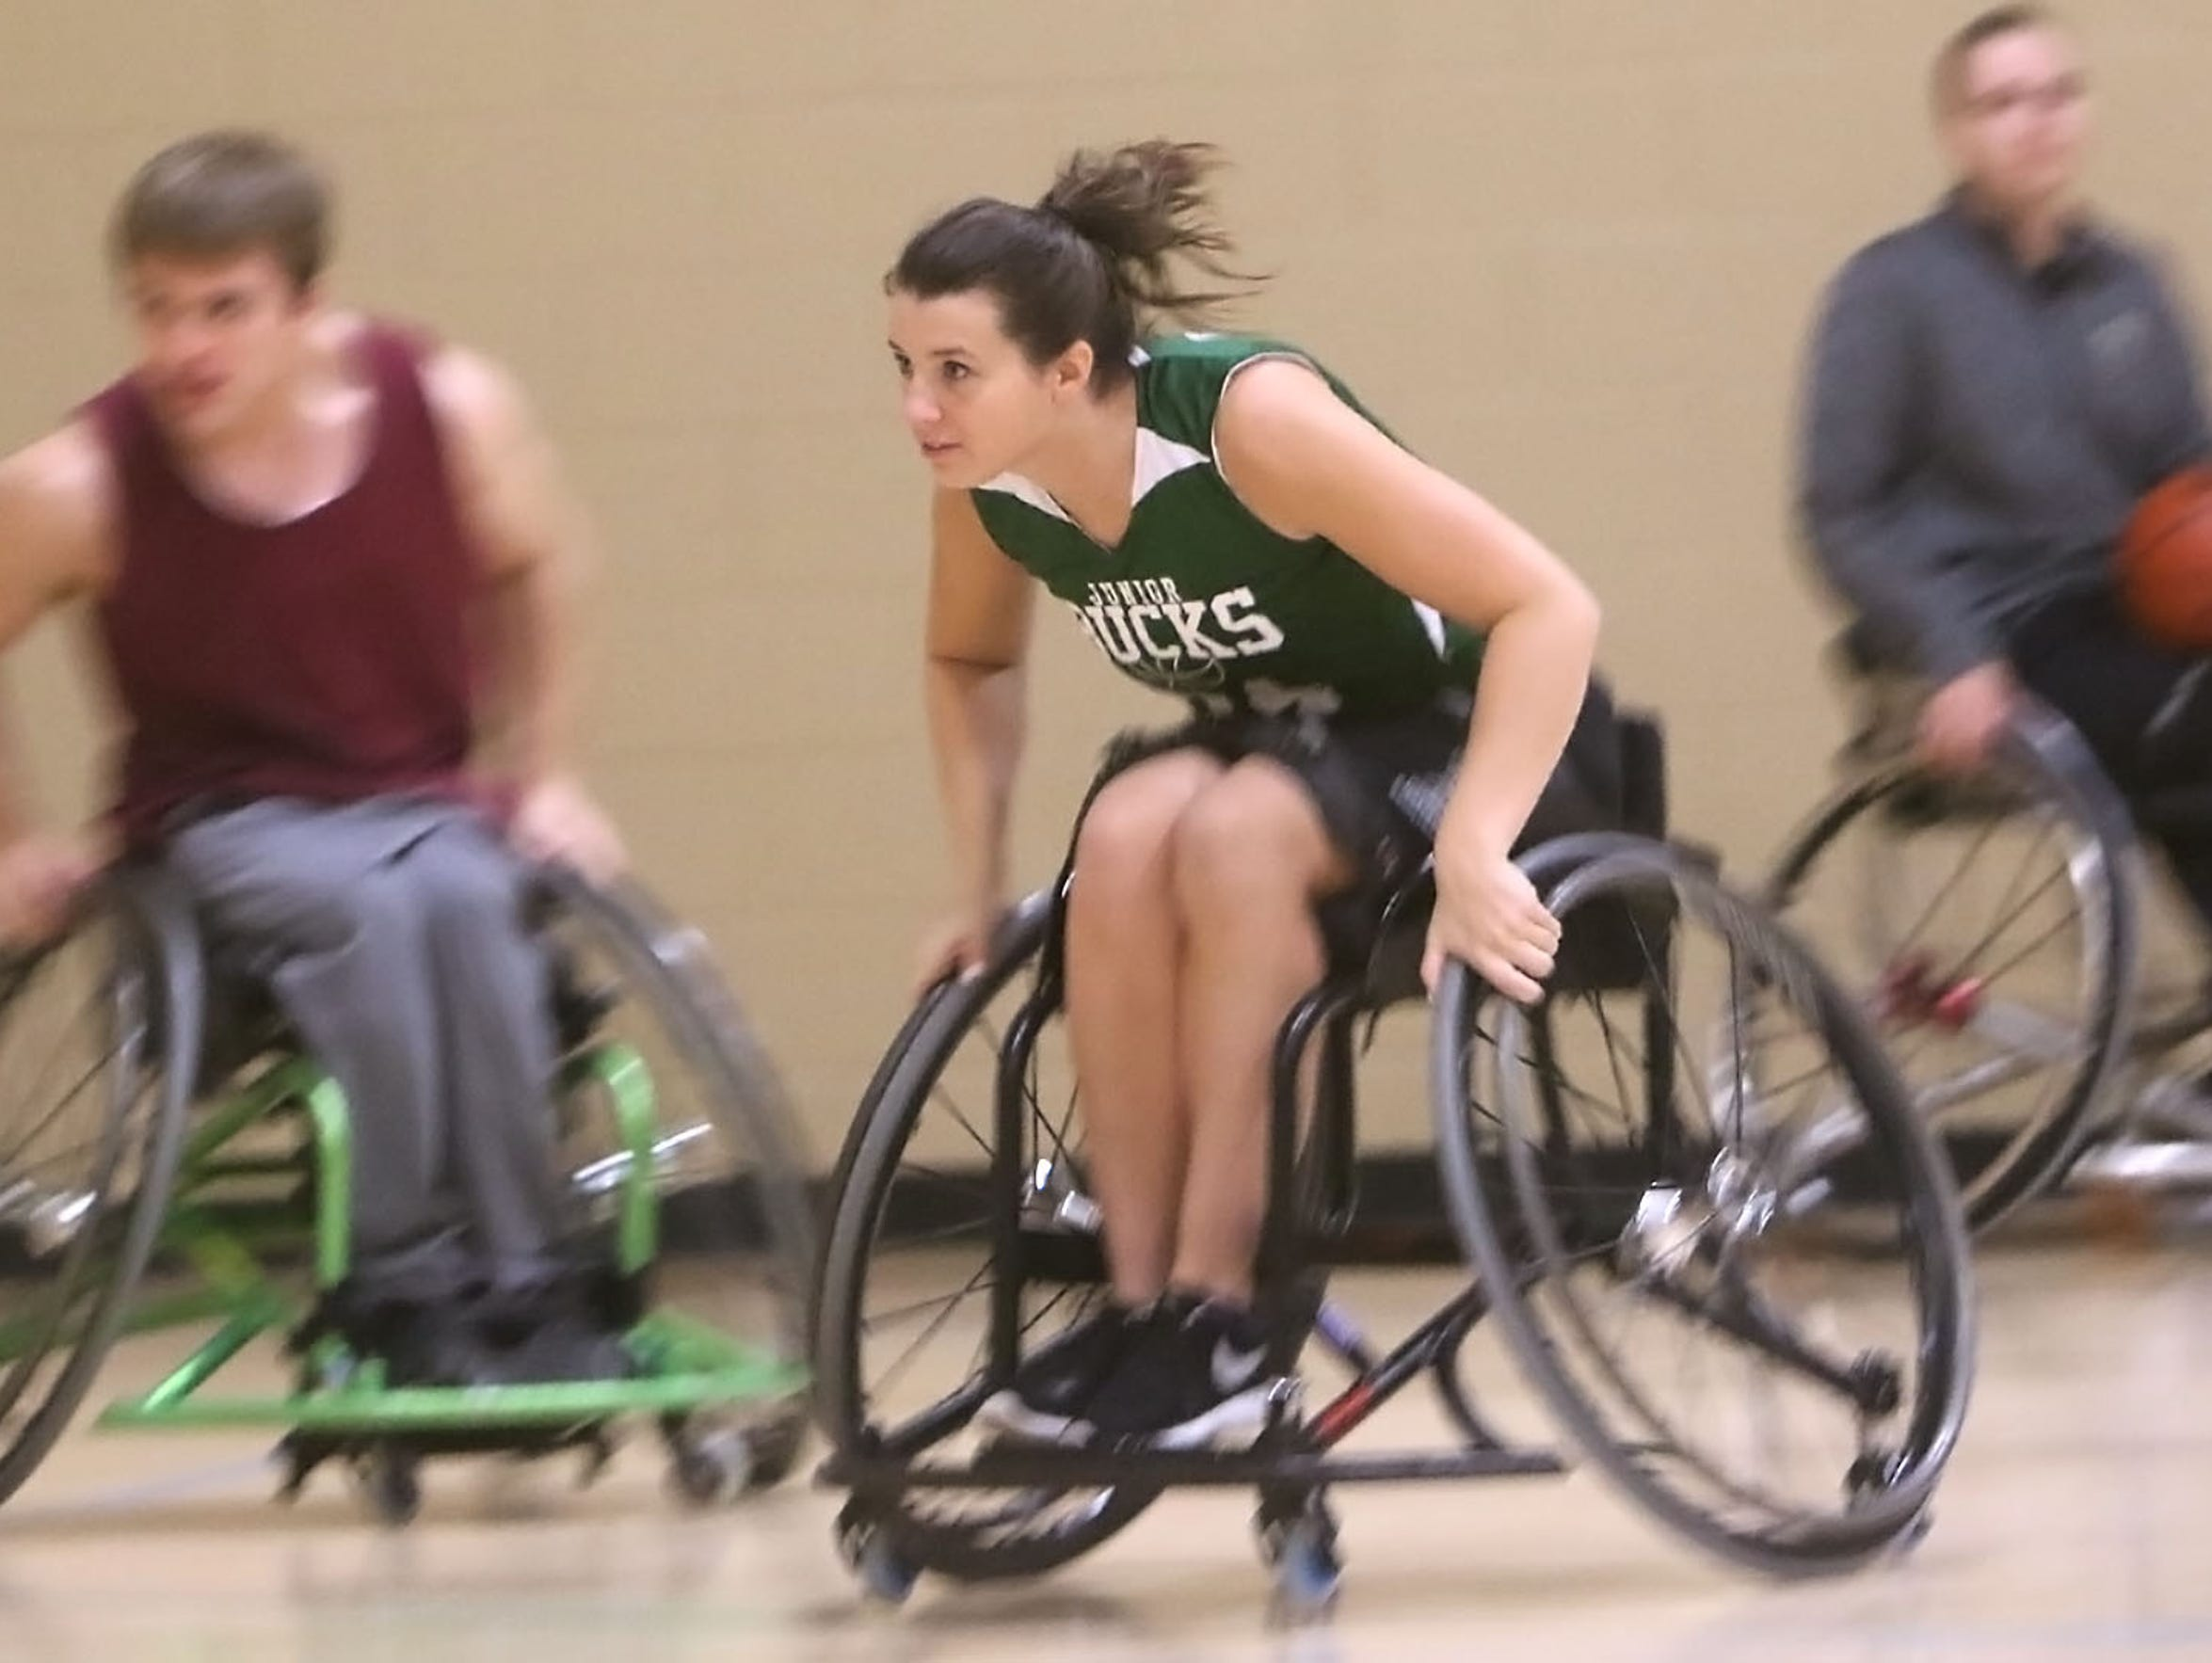 Emily Oberst takes part in a Milwaukee Wheelchair Bucks